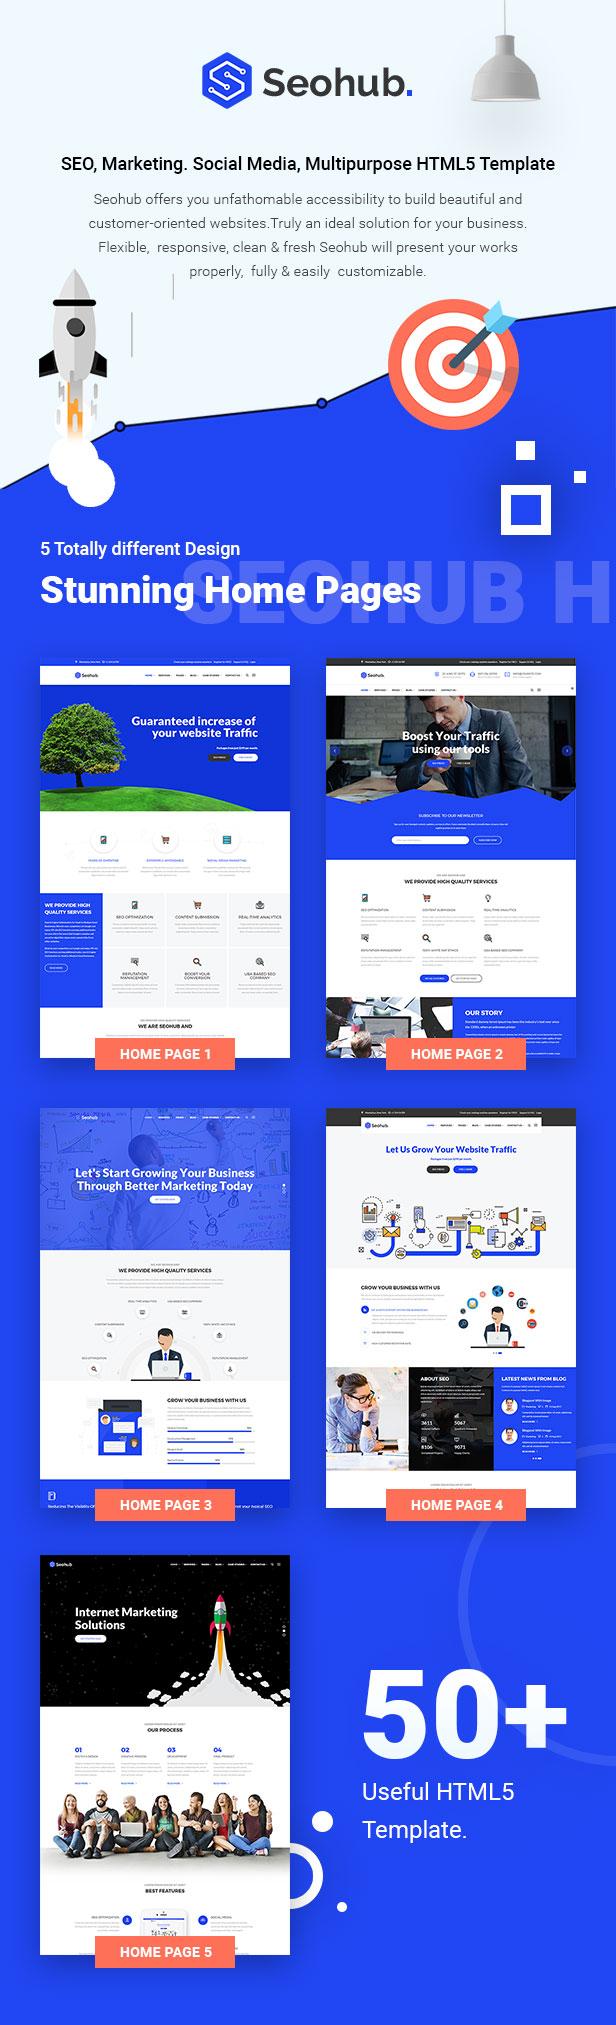 SEOhub - SEO, Marketing, Social Media, Multipurpose HTML5 Template - 6